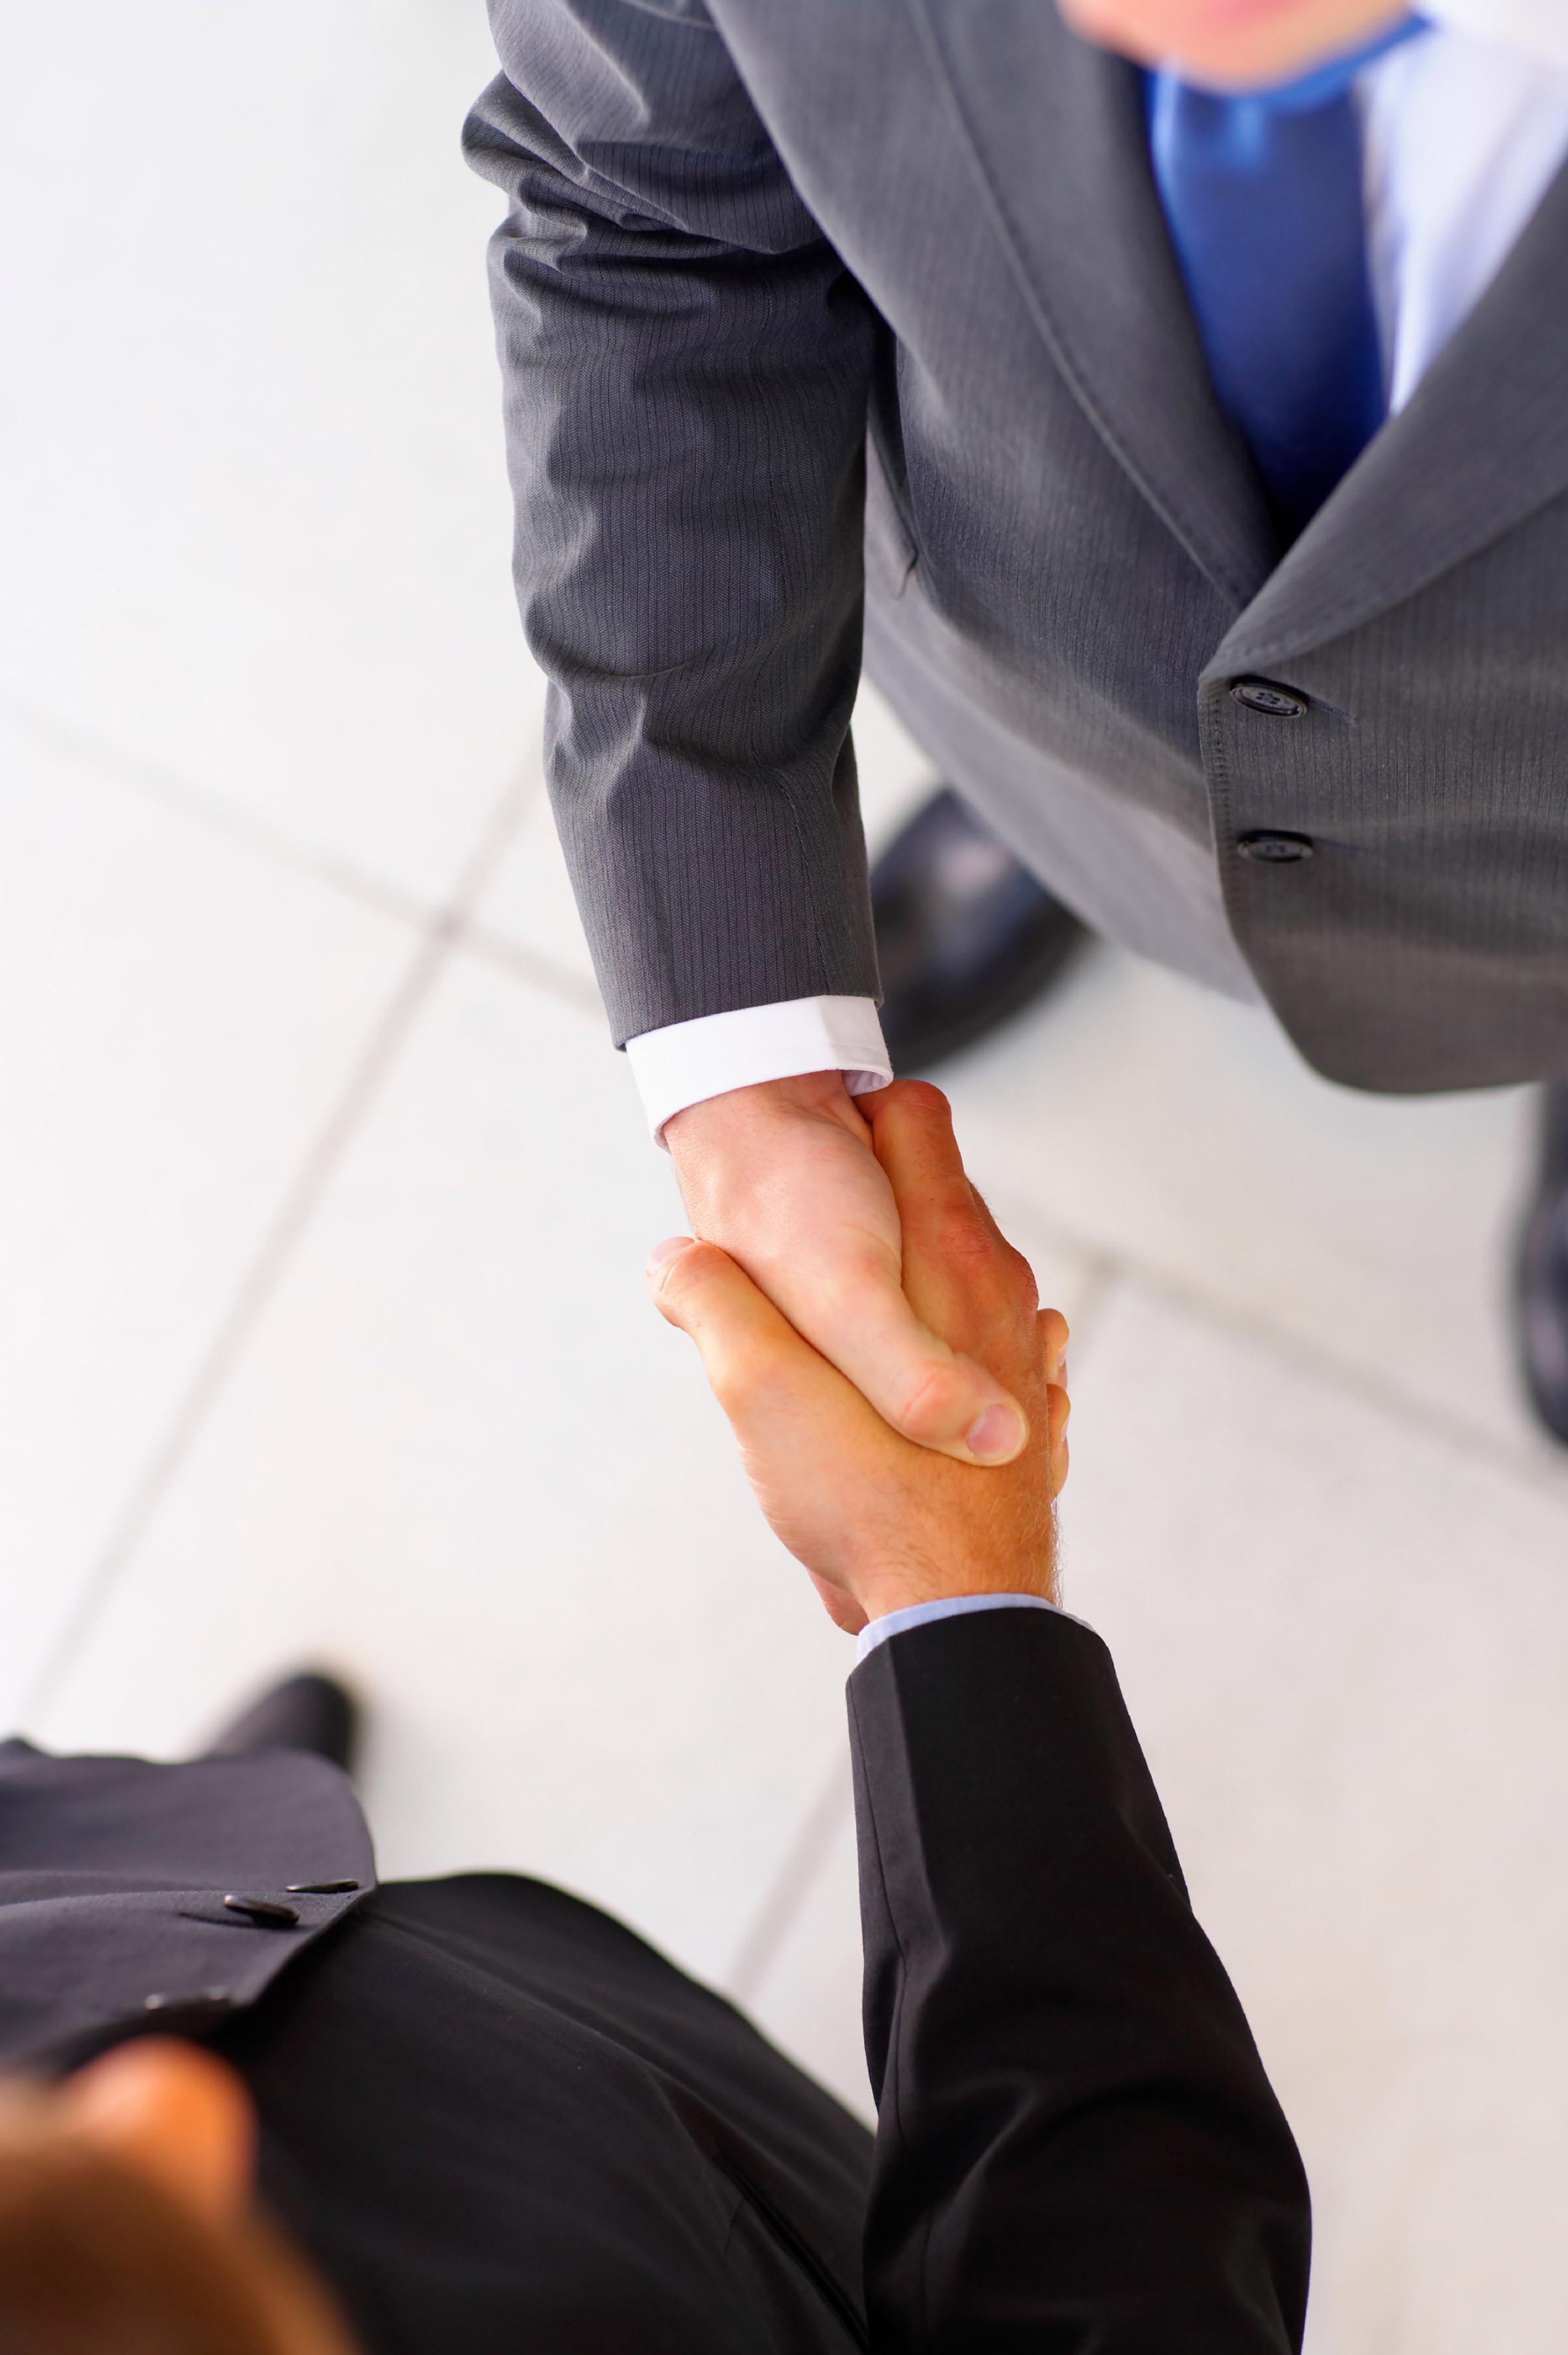 Australian businessmen shaking hands